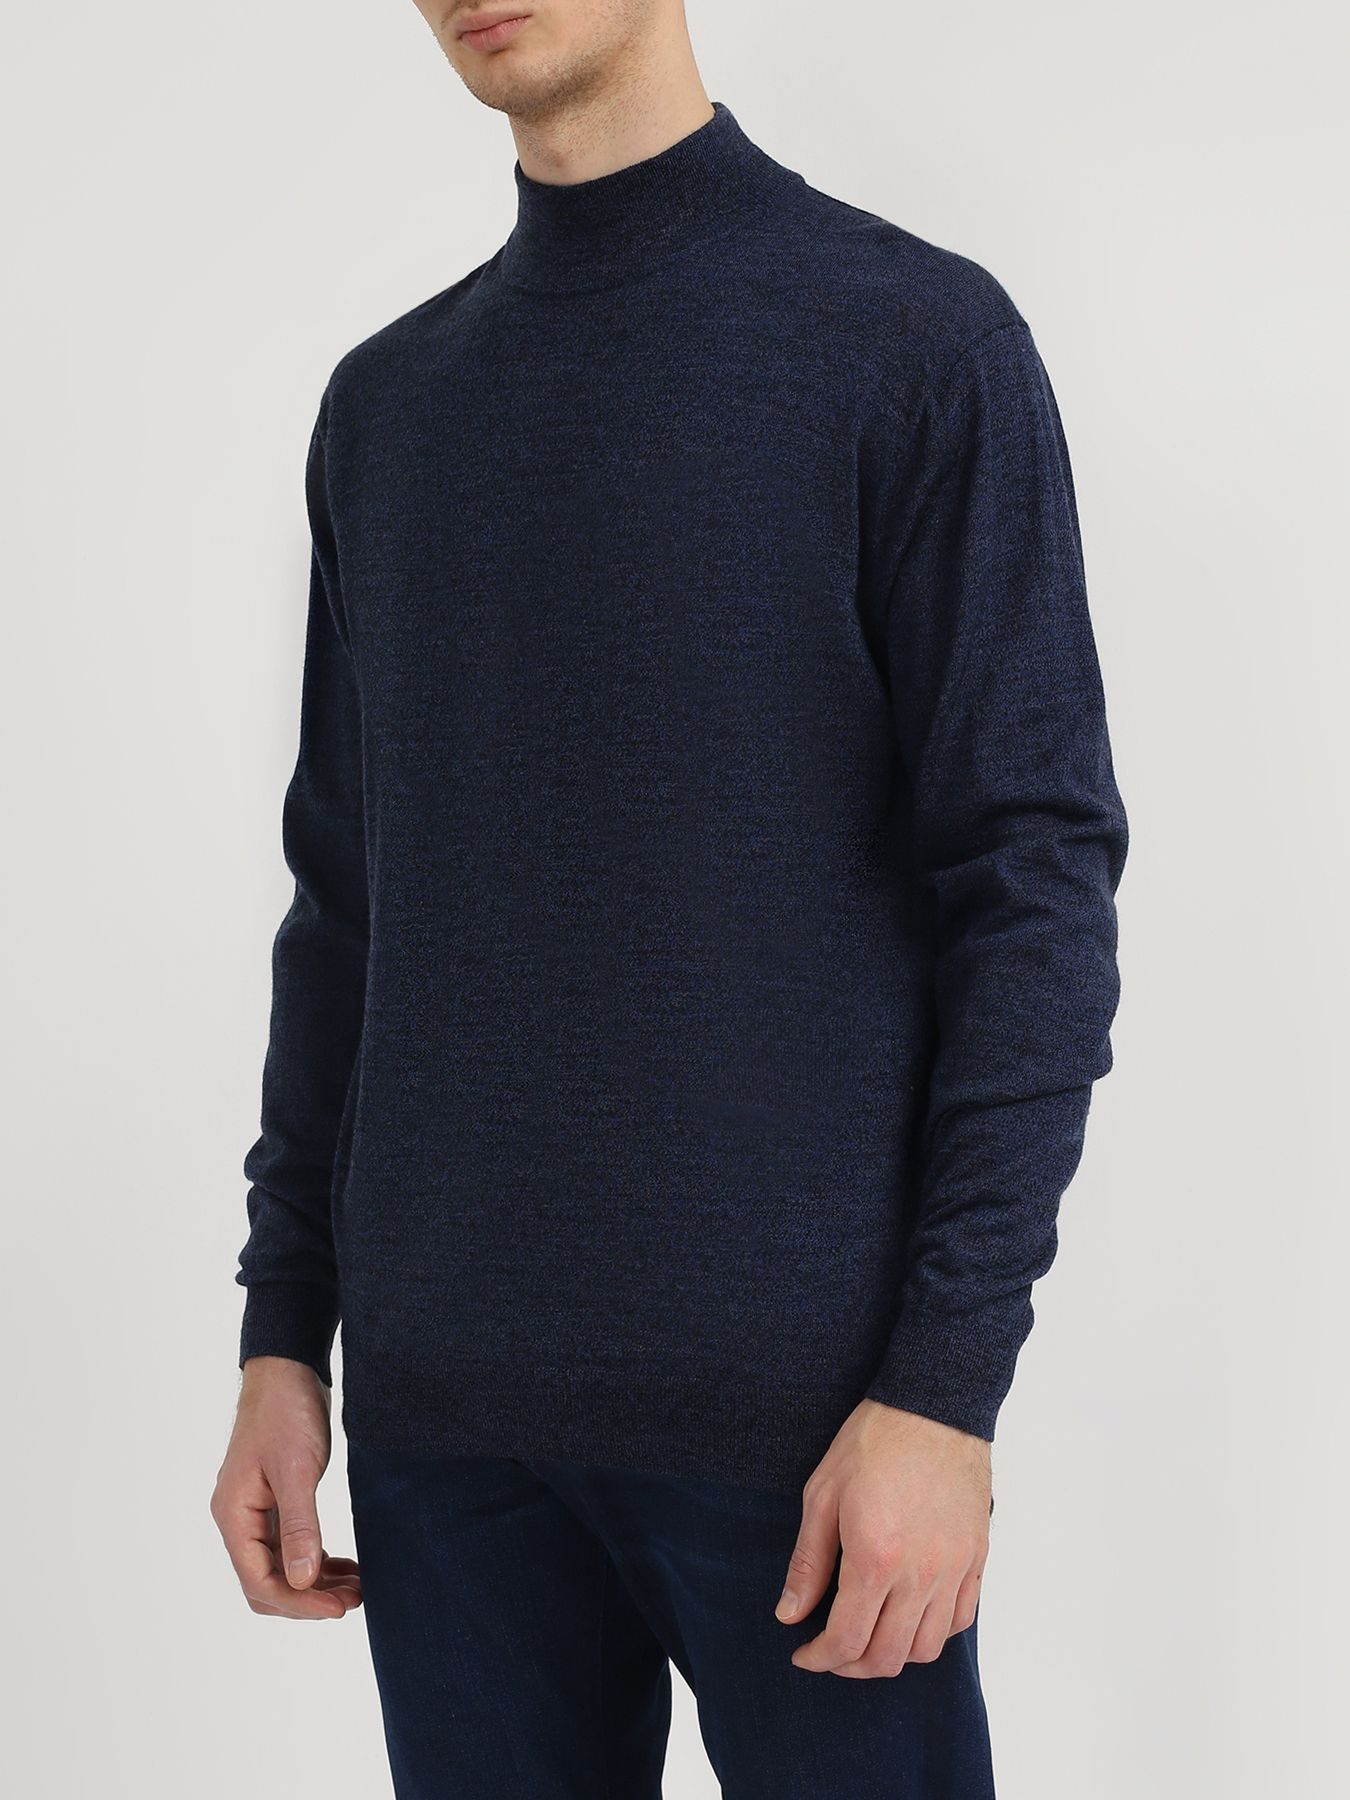 Ritter Шерстяной свитер